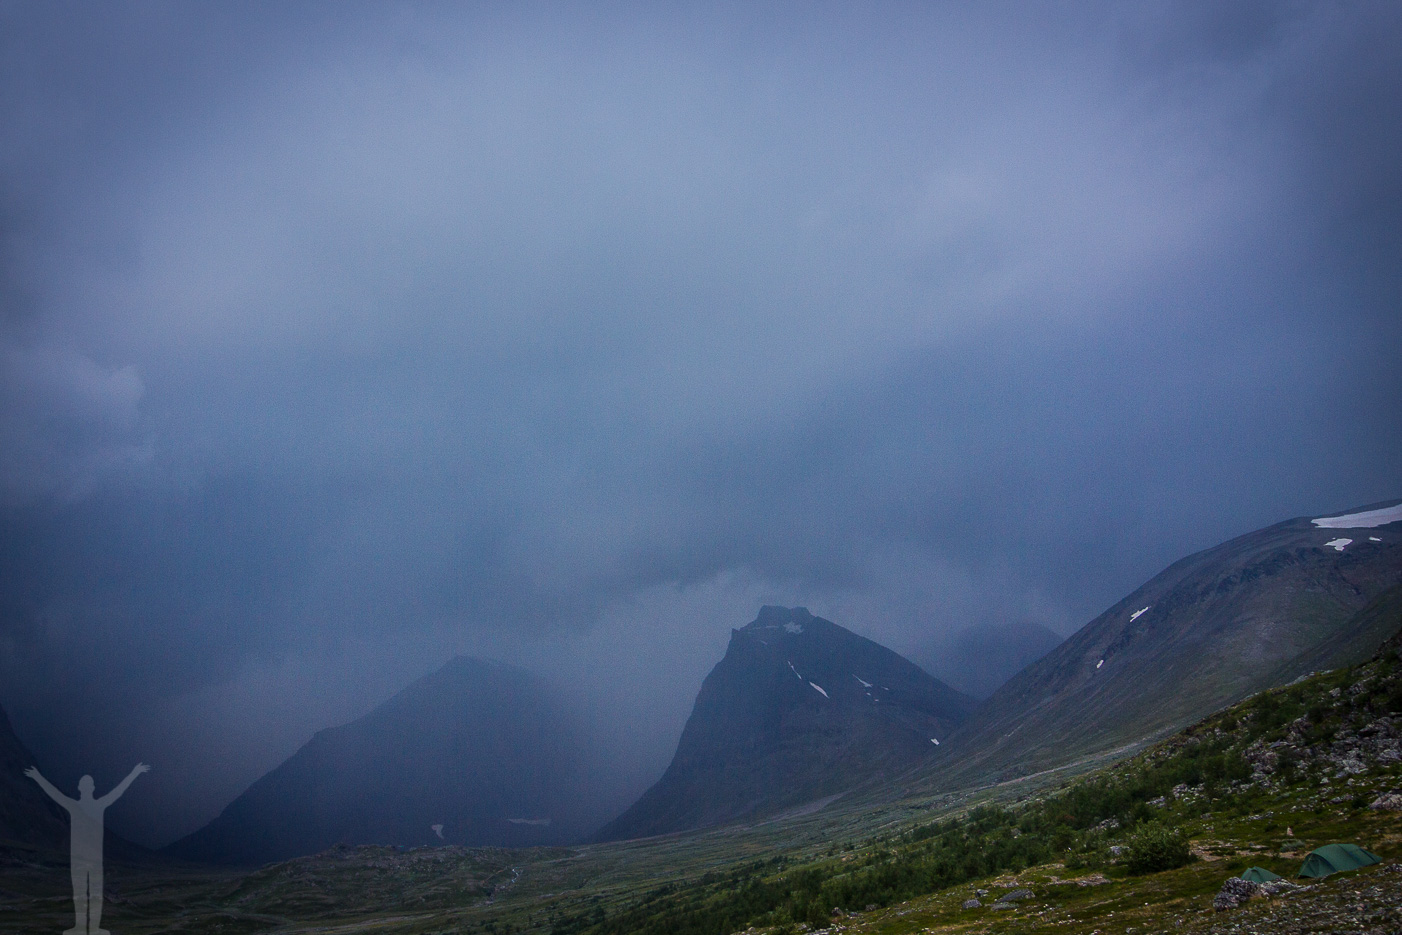 Dåligt väder vid Kebnekaise